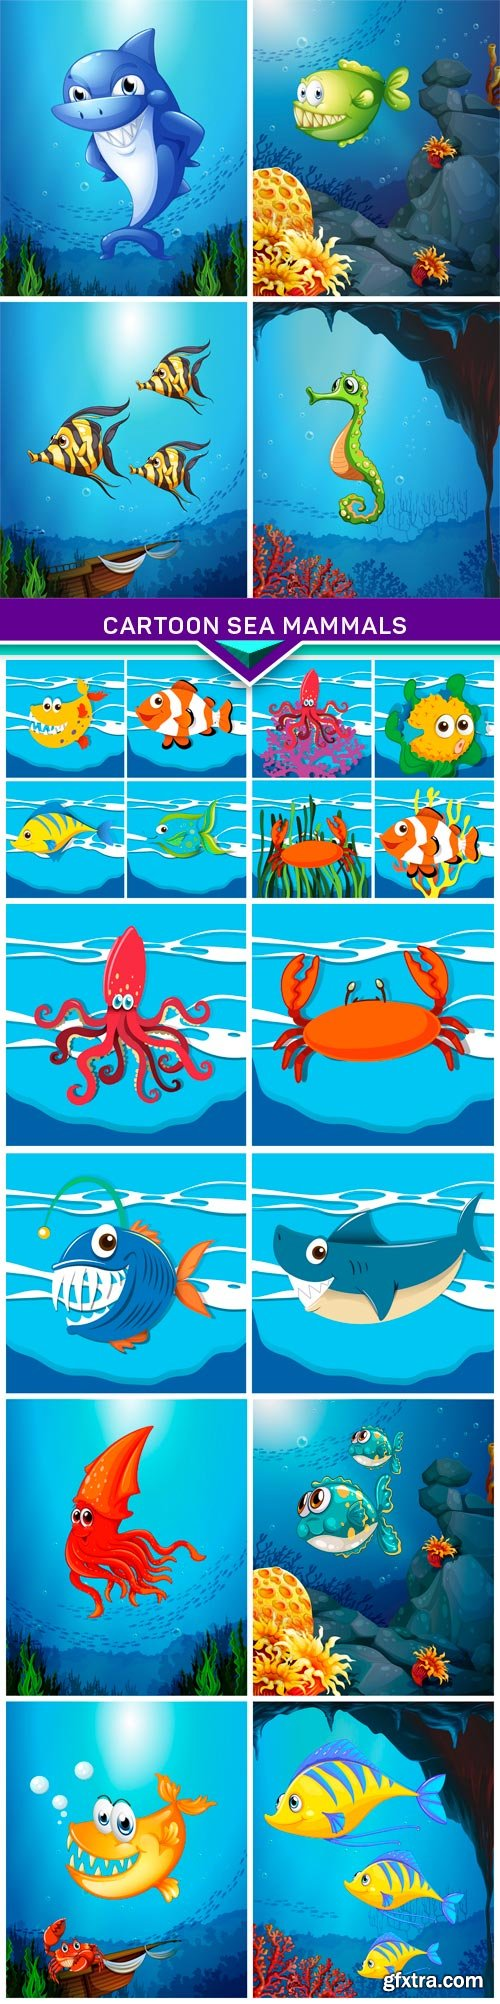 Cartoon sea mammals 5X EPS